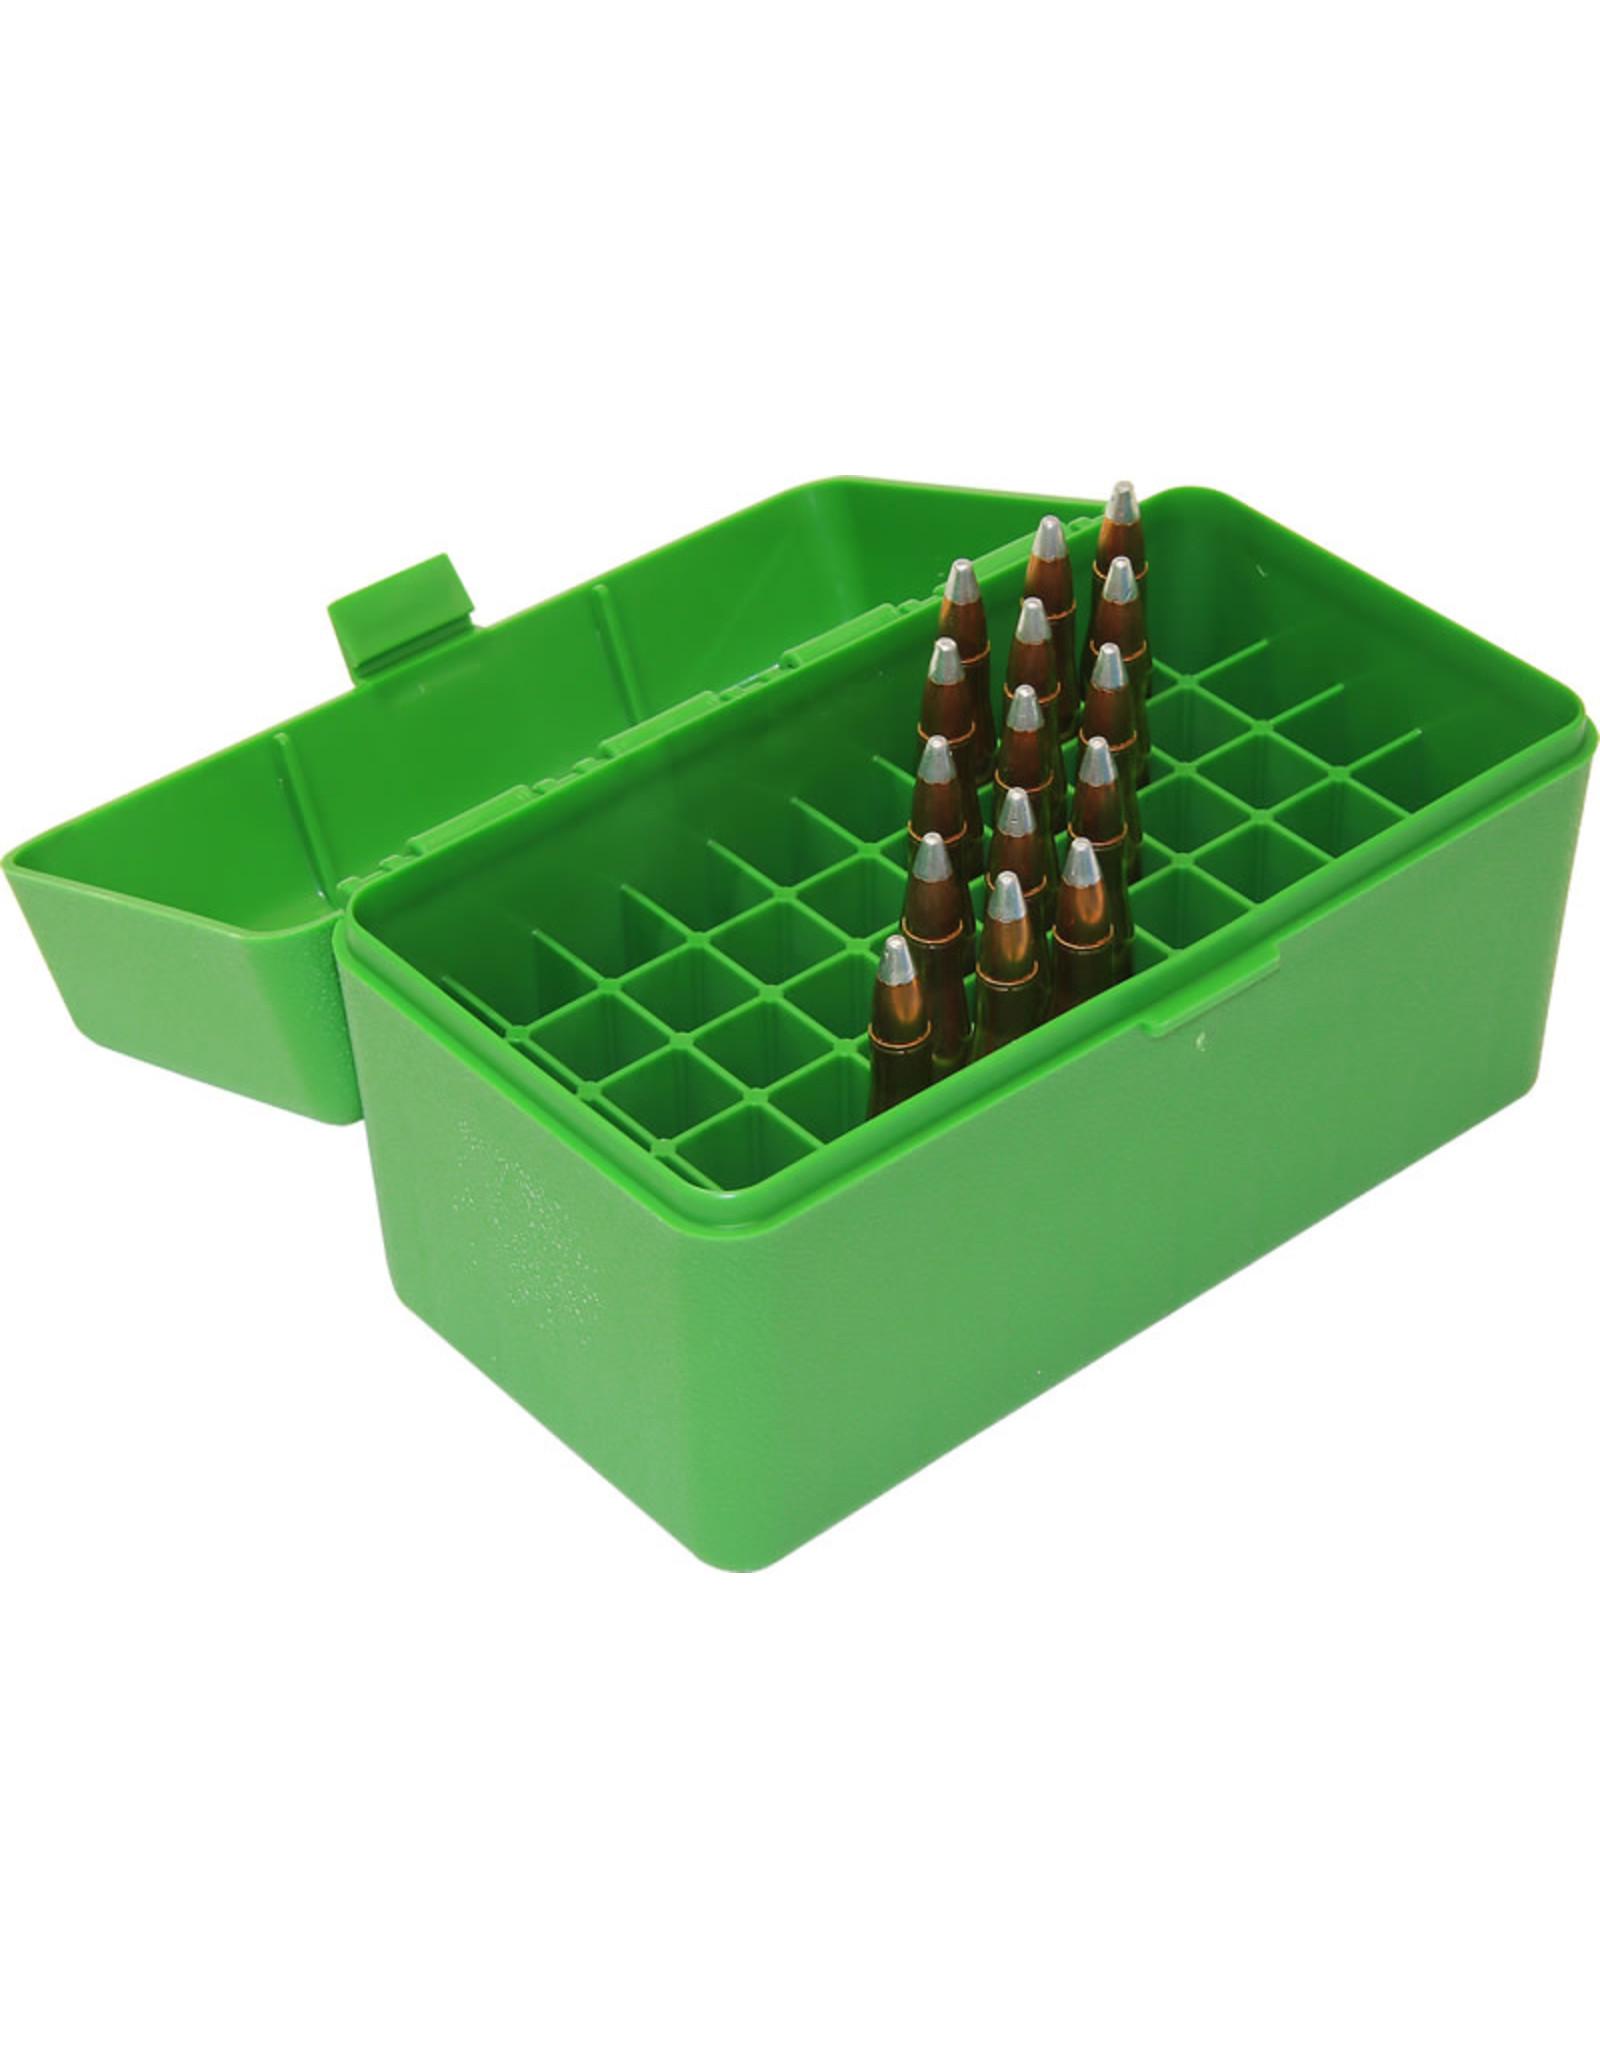 MTM Case-Gard MTM RLLD-50-10 Case Gard Ammo Box